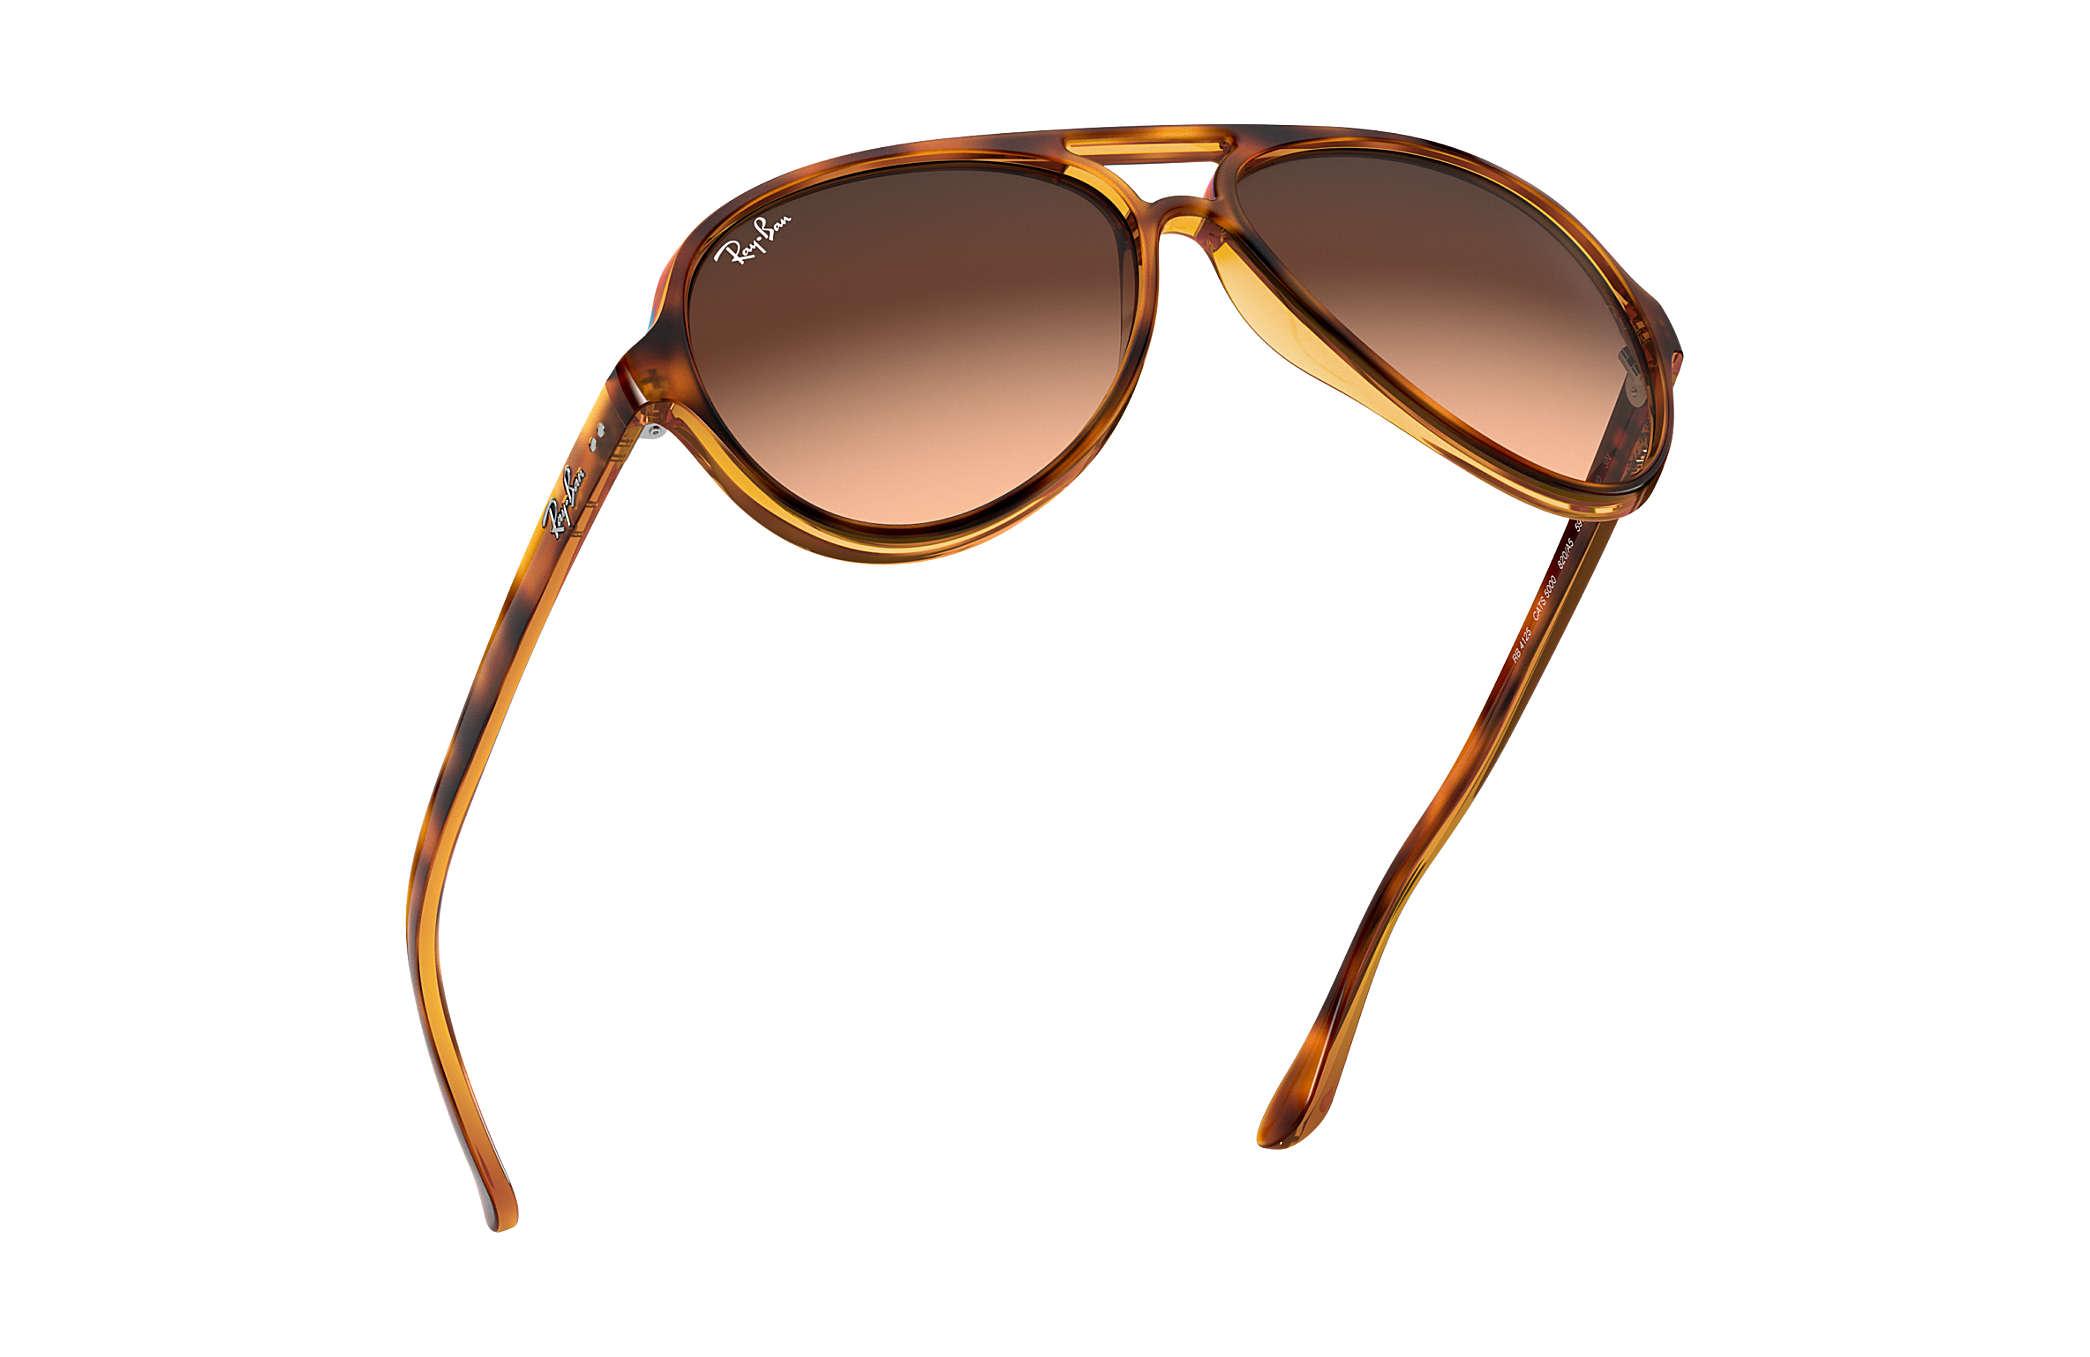 35fb4f4cb8 ... havana sunglasses rb 4125 710 51 59mm sd 348e2 3c6df  official store ray  ban 0rb4125 cats 5000 classic tortoise sun aa995 e00b5